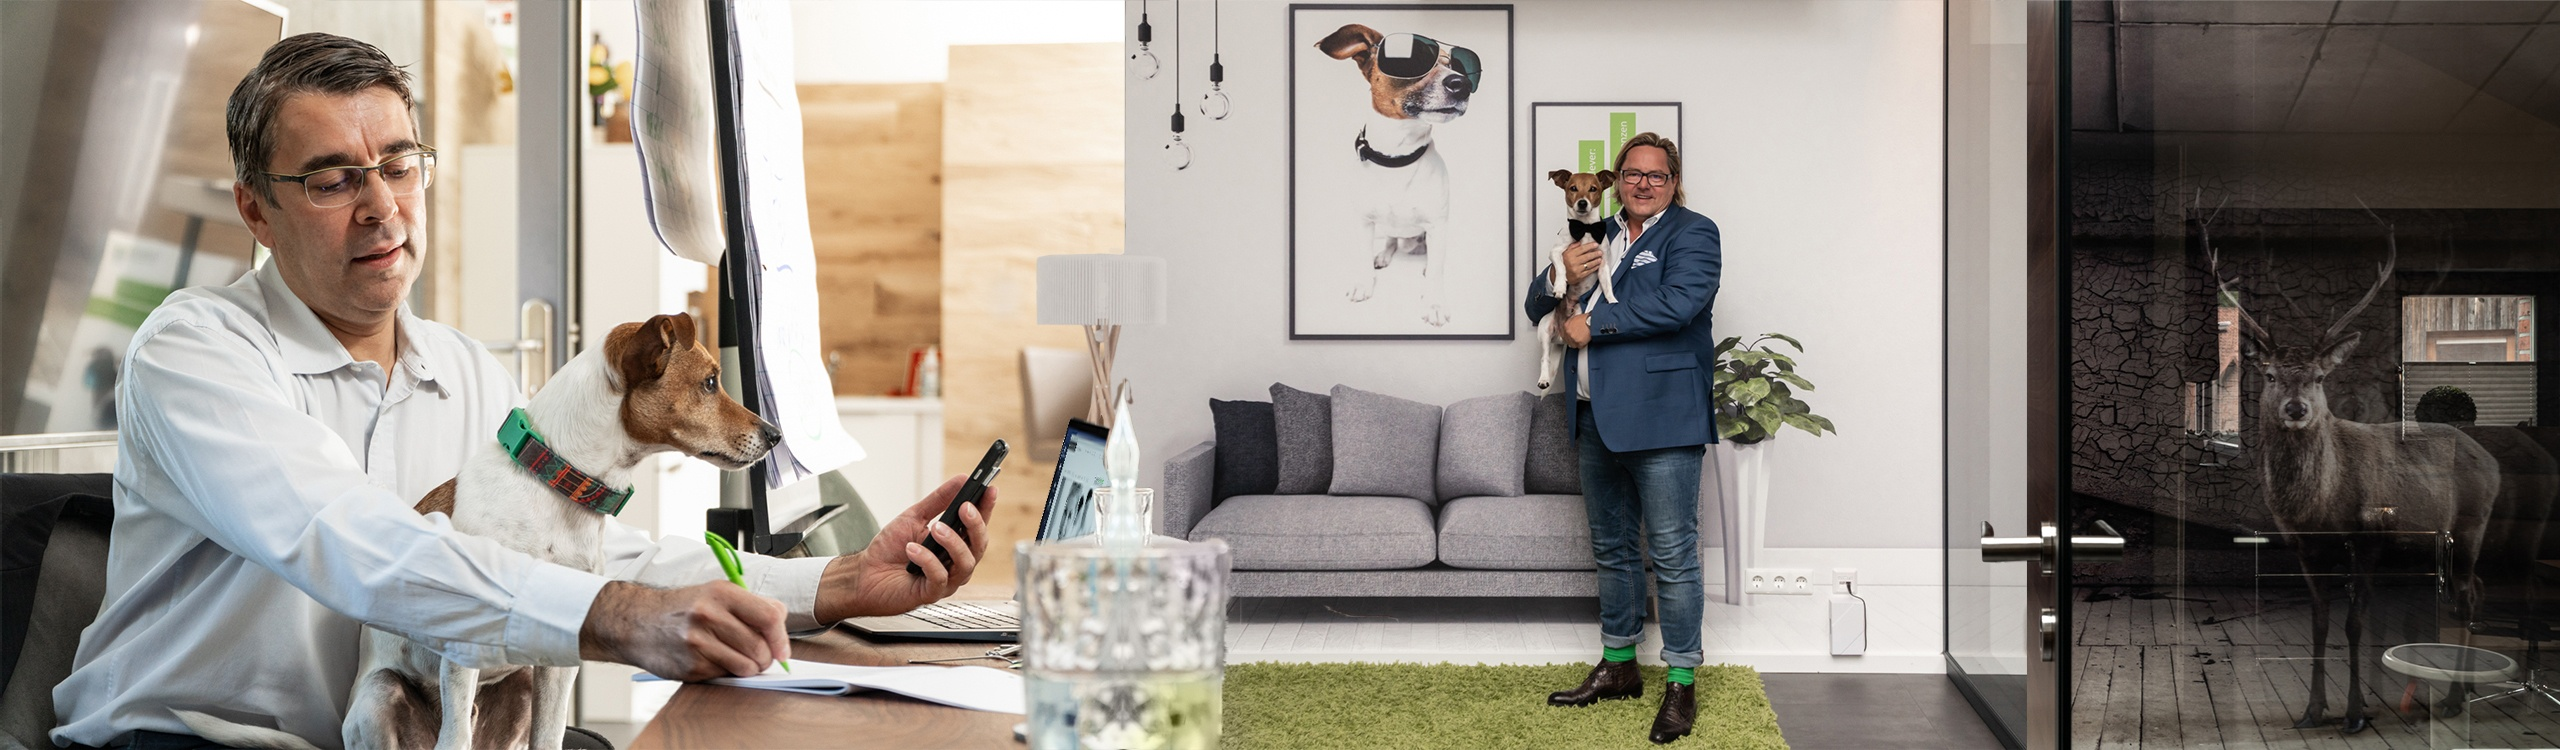 Unternehmensfotografie Businessfotograf Werbefotografie Linus Klose Photography Fotograf Bremen